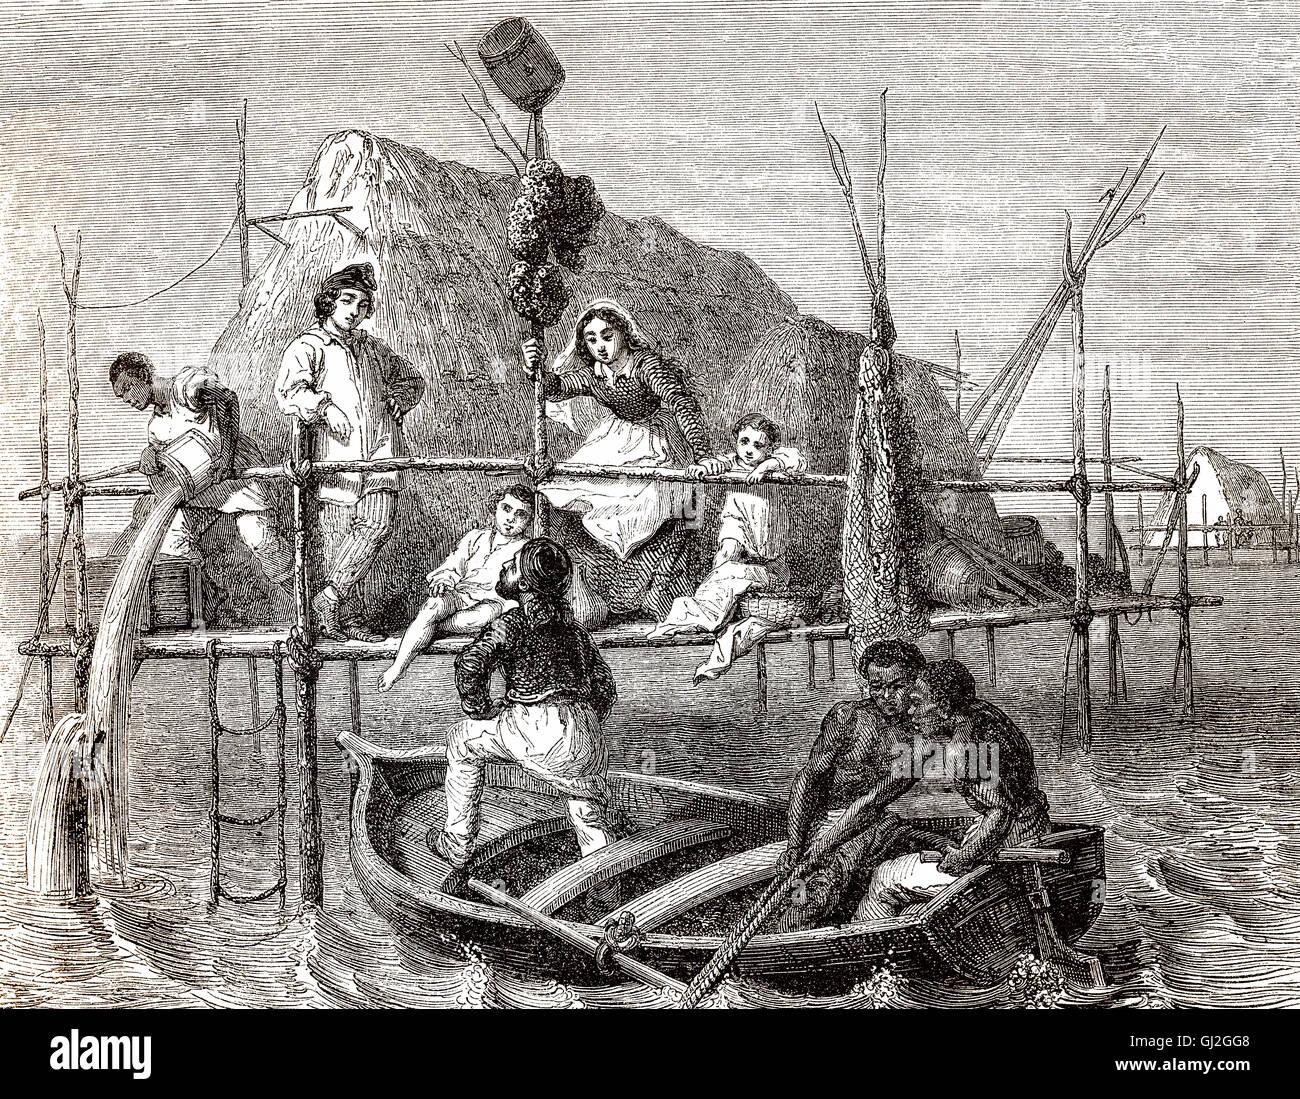 Sponge divers, Cuba, 19th century - Stock Image